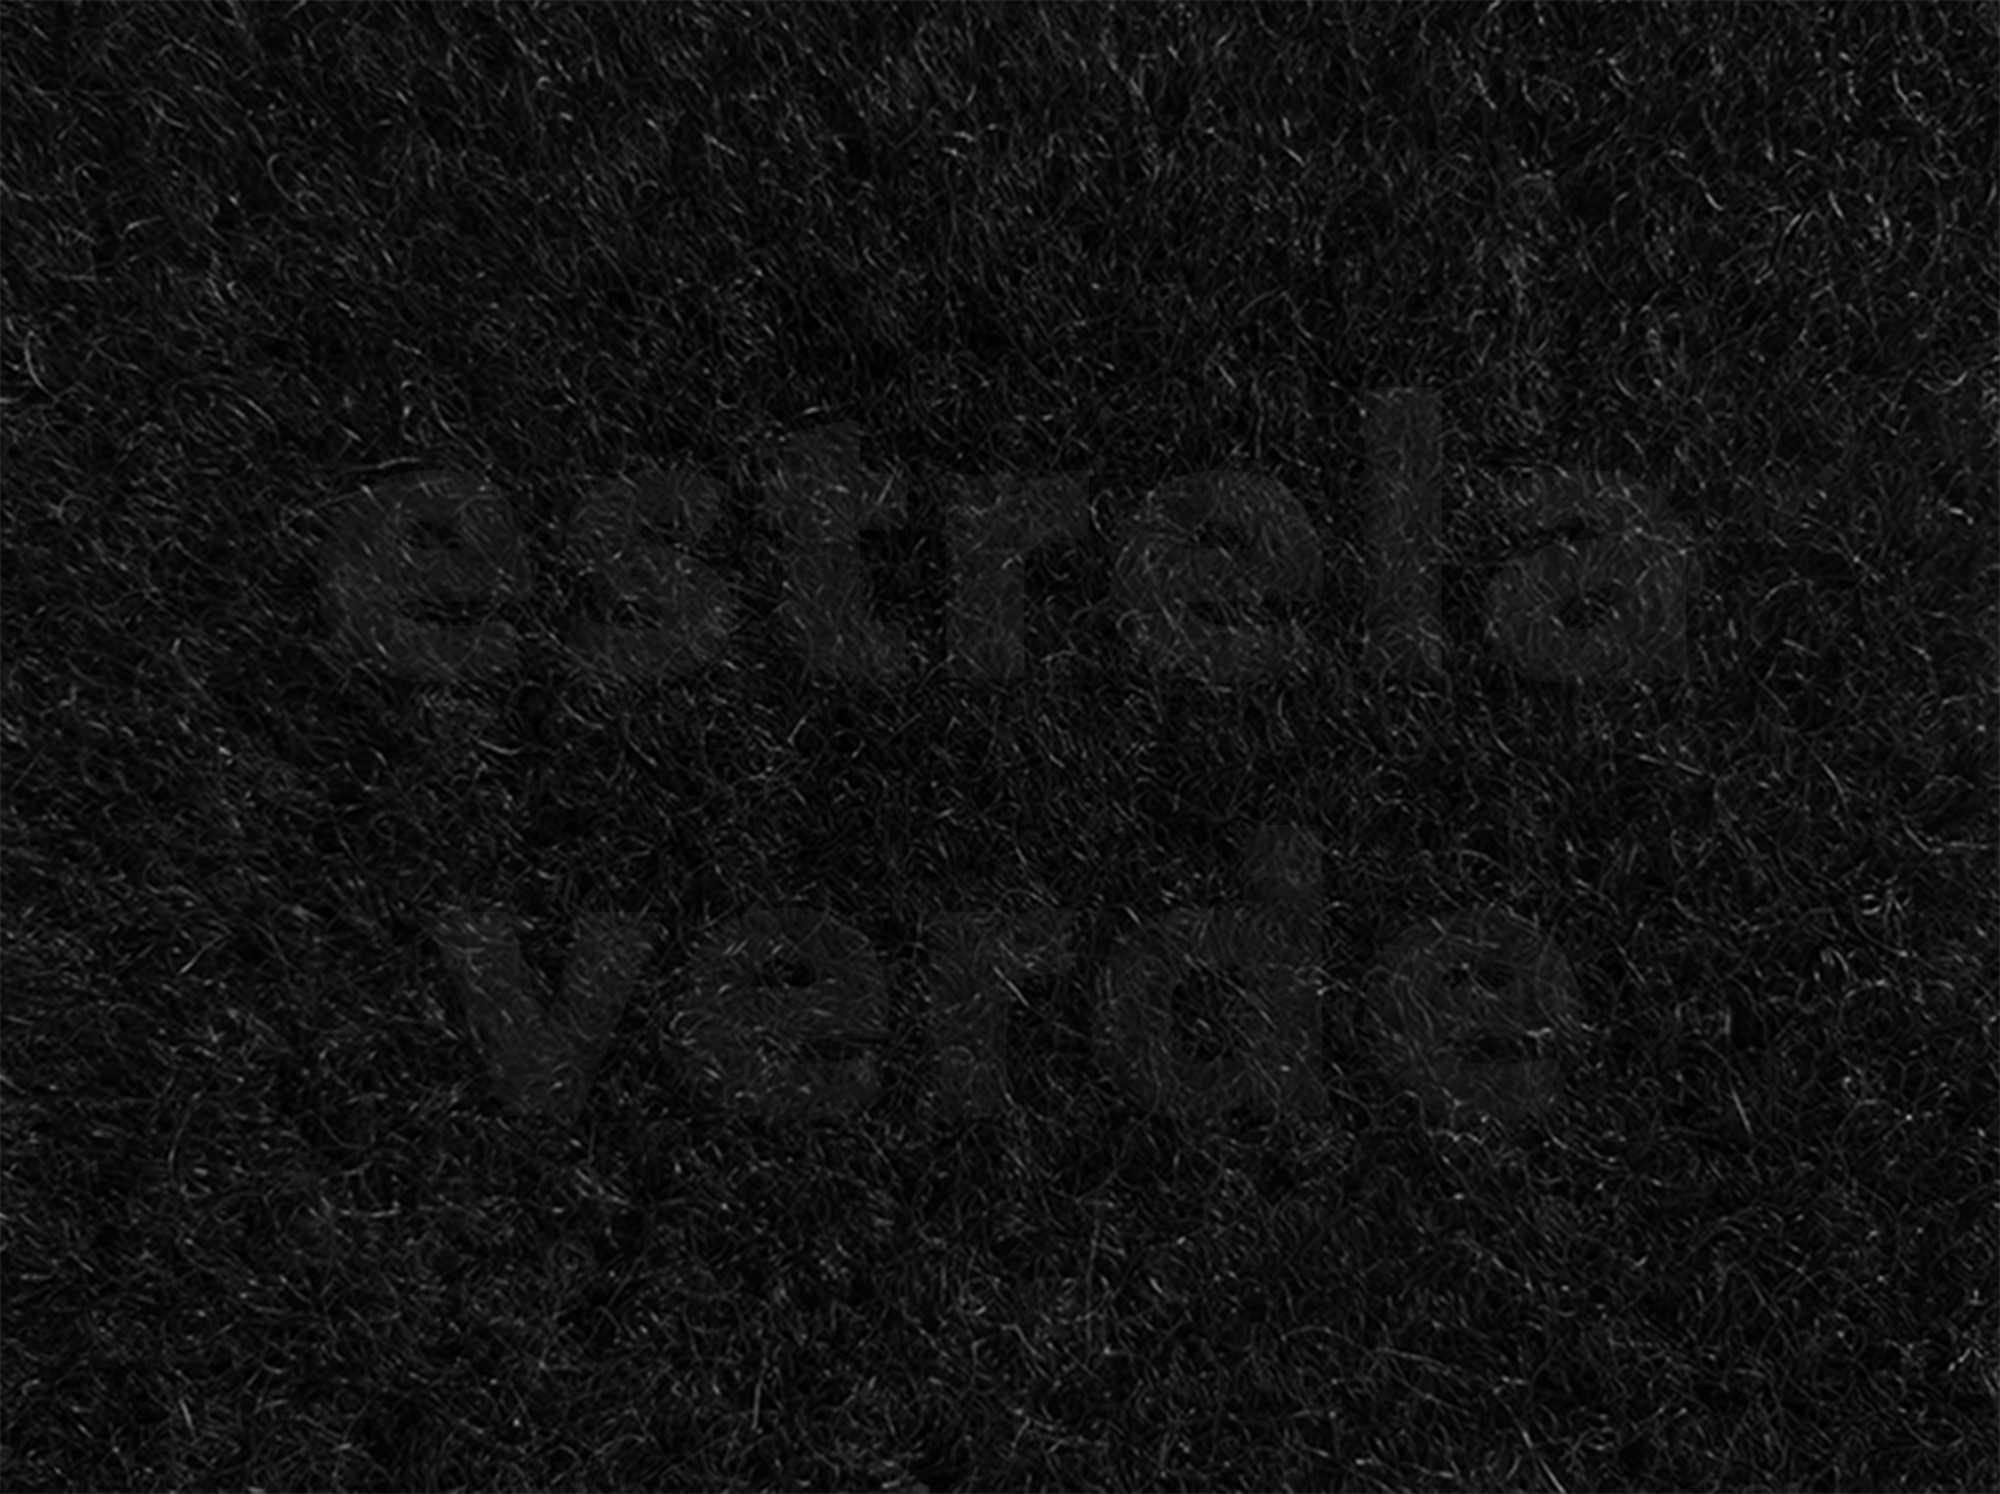 CARPETE PRETO S/ RESINA (900) 2,00 LARG €  - Estrela Verde